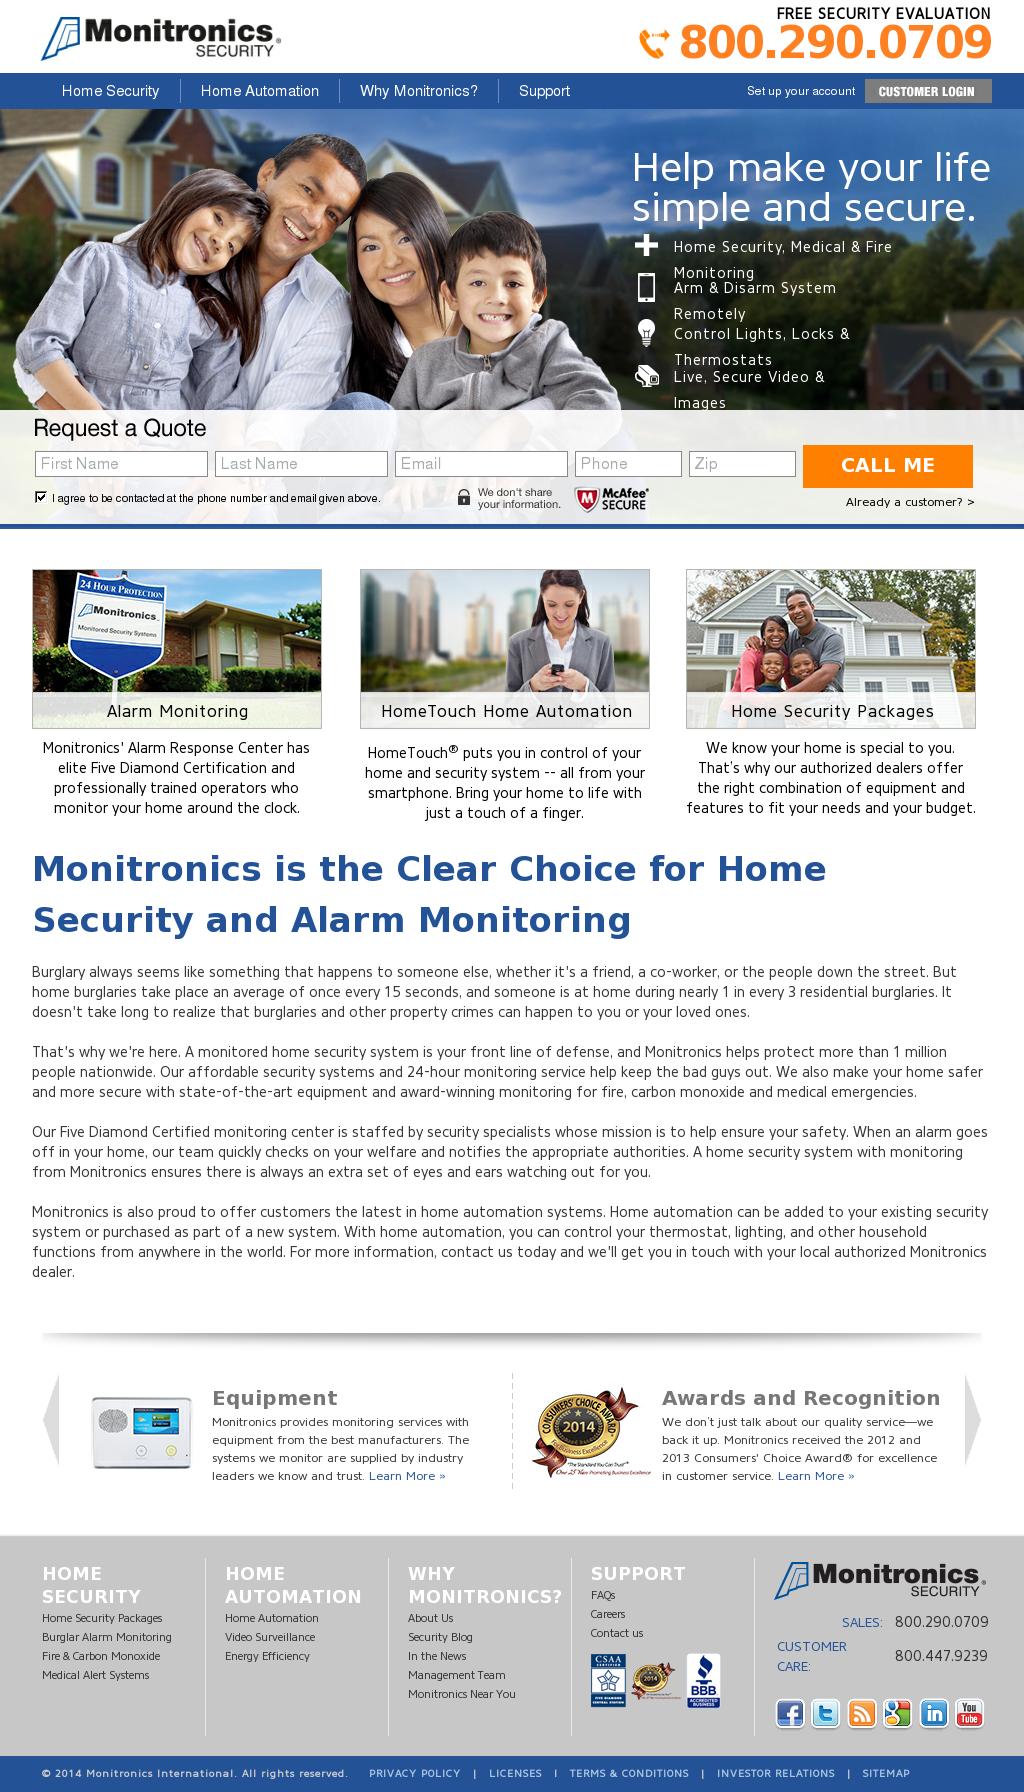 Monitronics Competitors, Revenue and Employees - Owler Company Profile